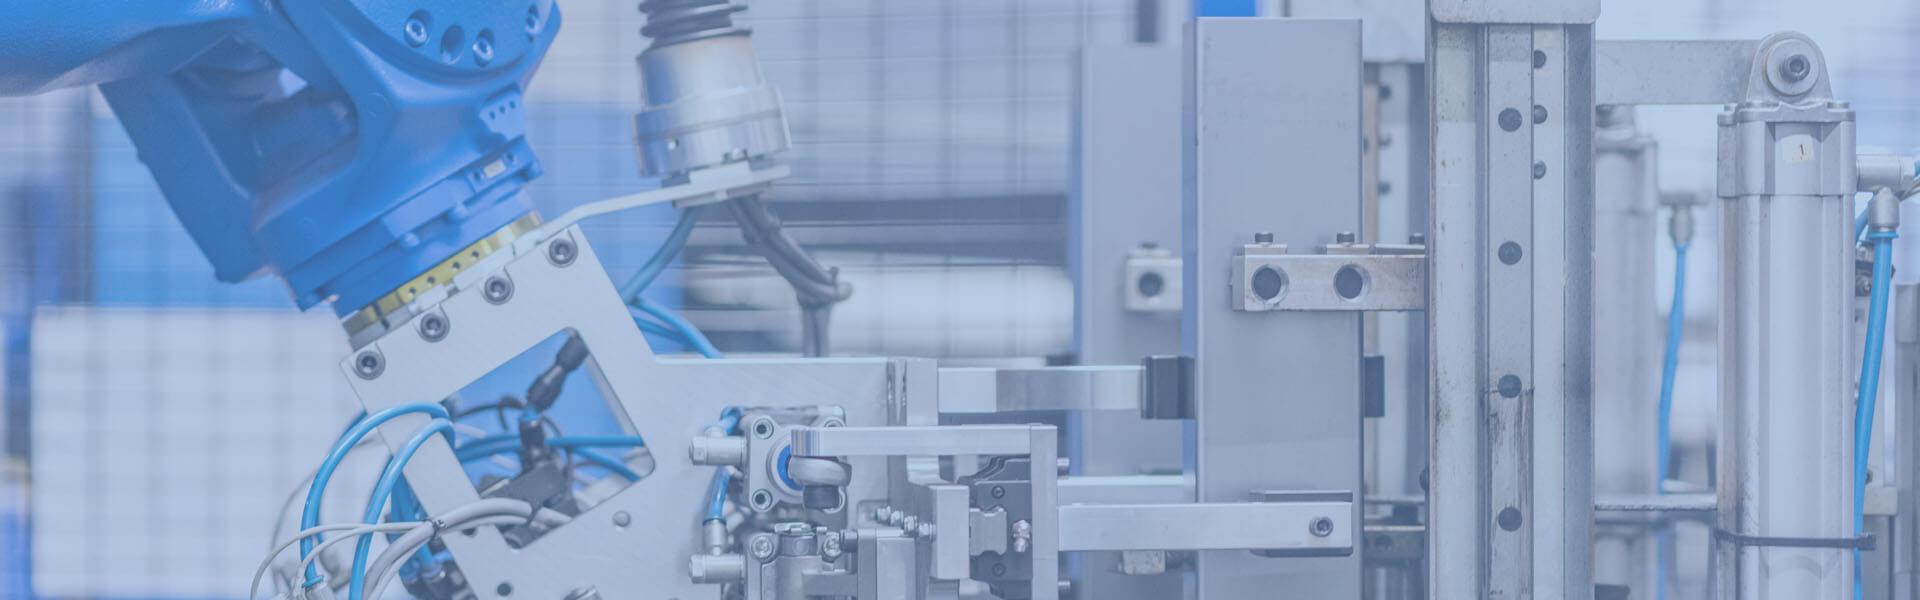 LINAK Profiles manufacturing